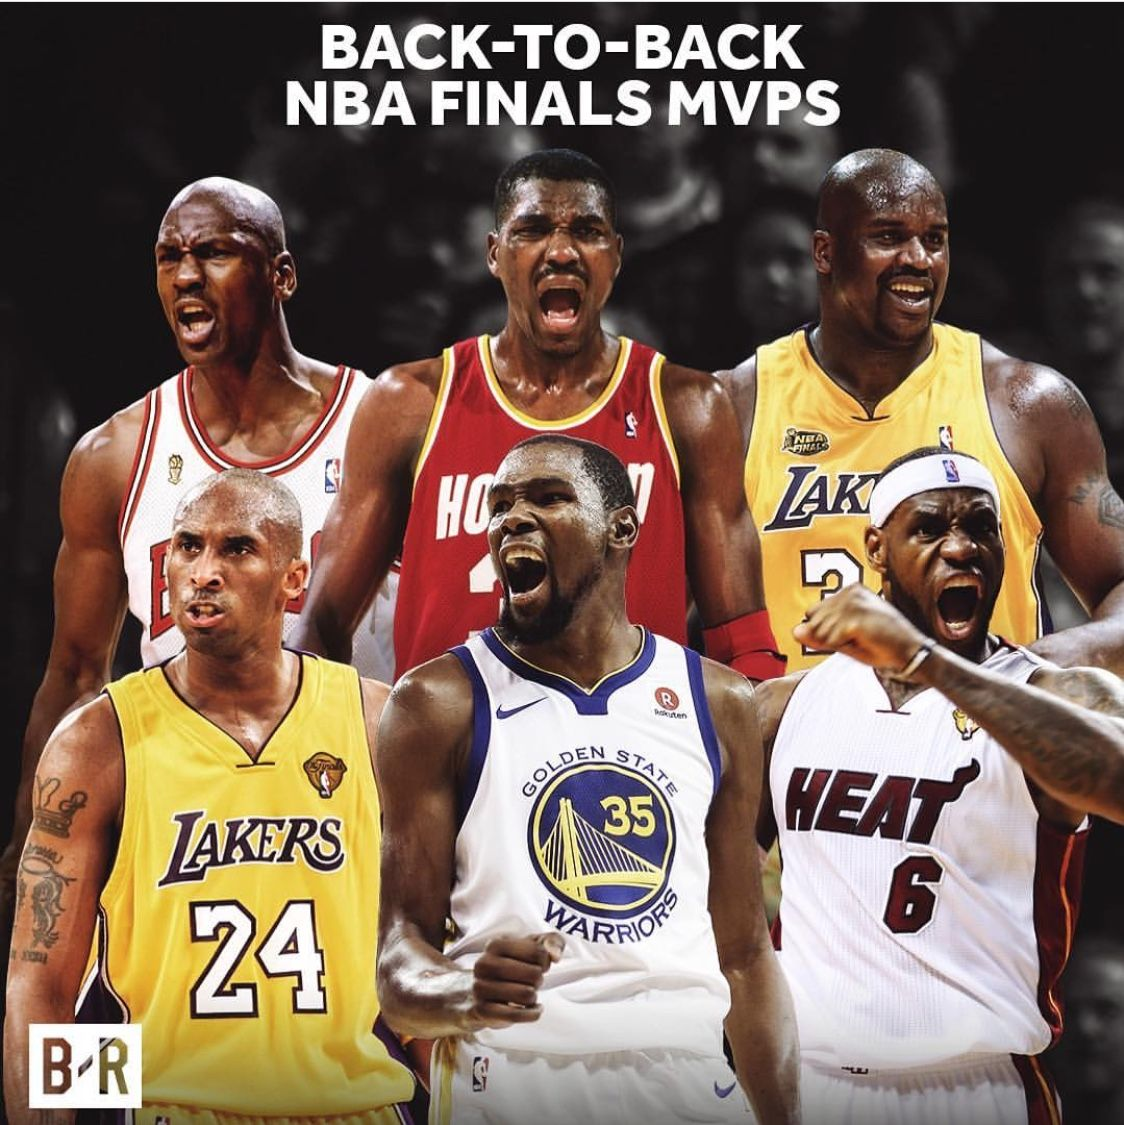 Back To Back Nba Finals Mvp Michael Jordan Hakeem Olajuwon Shaq Kobe Bryant Lebron James And Kevin Durant Nba Finals Nba Players Basketball Legends